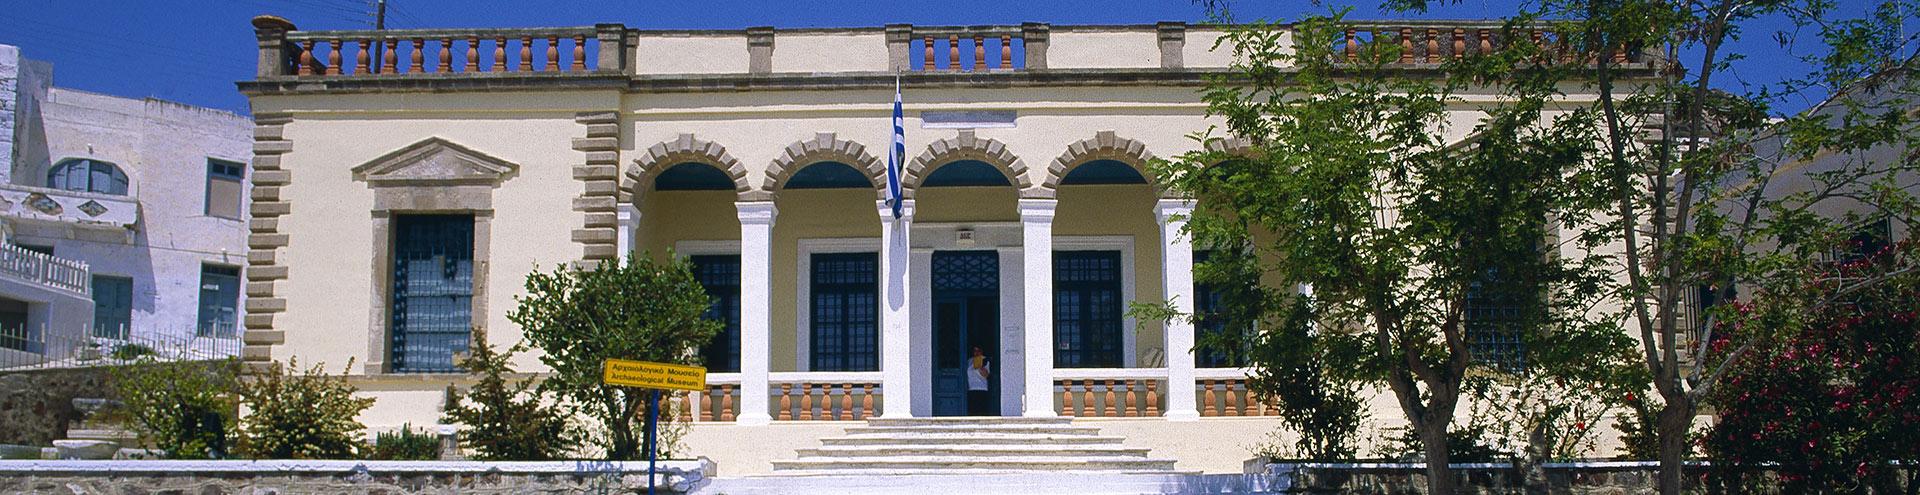 Archäologisches Museum Milos